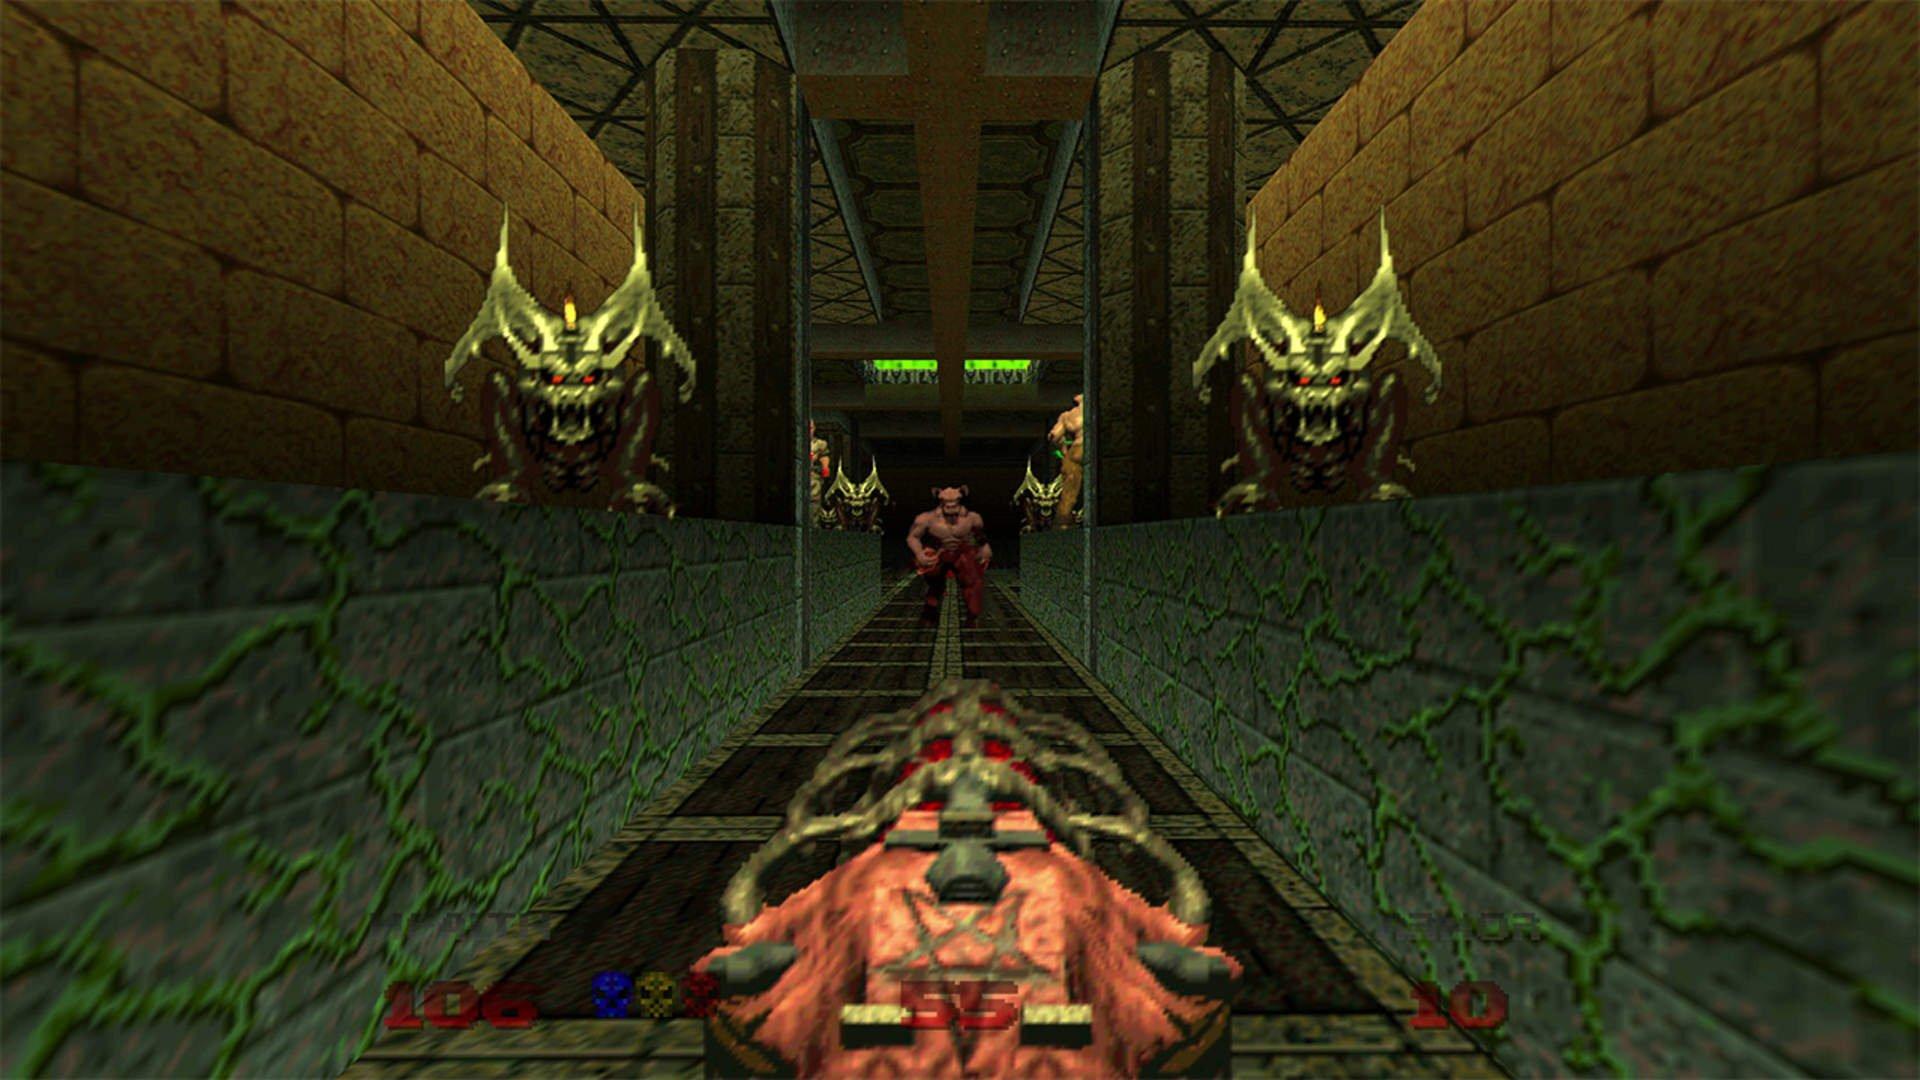 Doom Eternal doesn't run at 4K resolution on Google Stadia